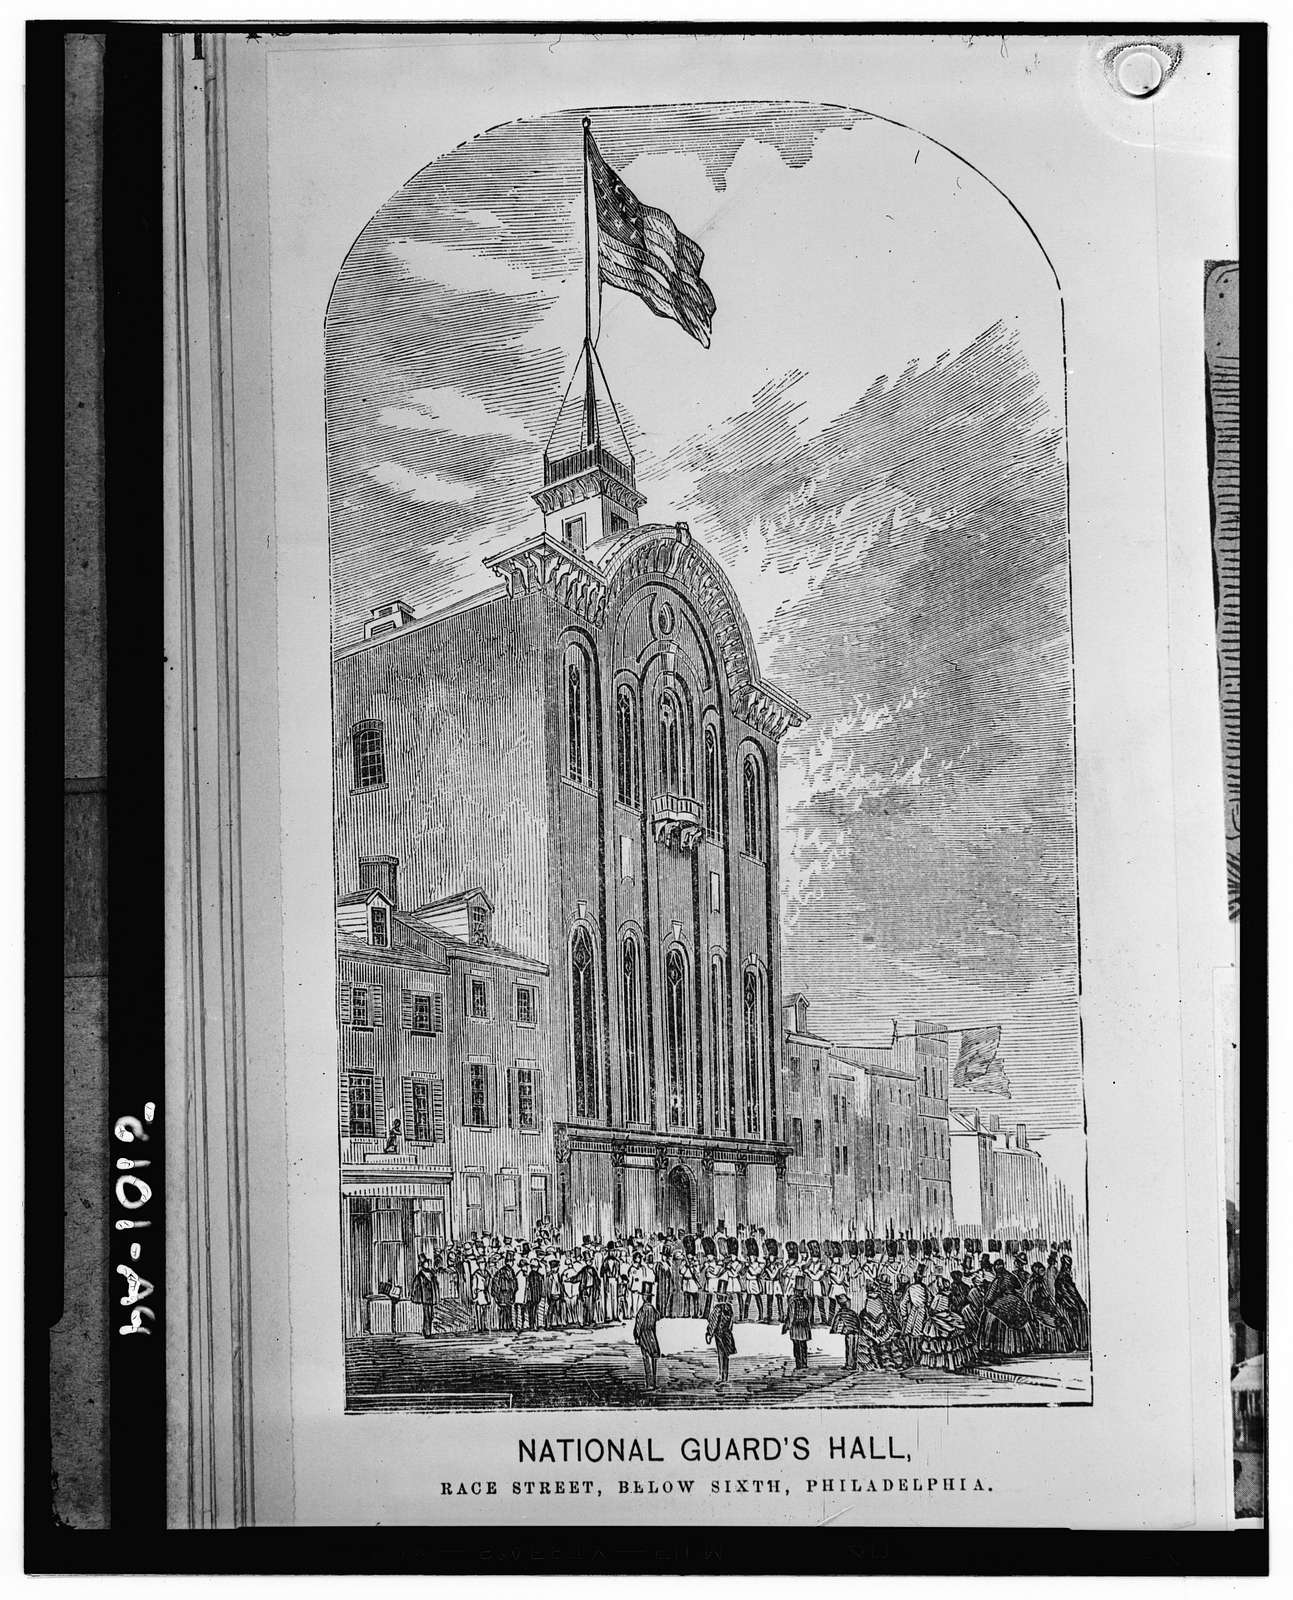 National Guard's Hall, 518-20 Race Street, Philadelphia, Philadelphia County, PA